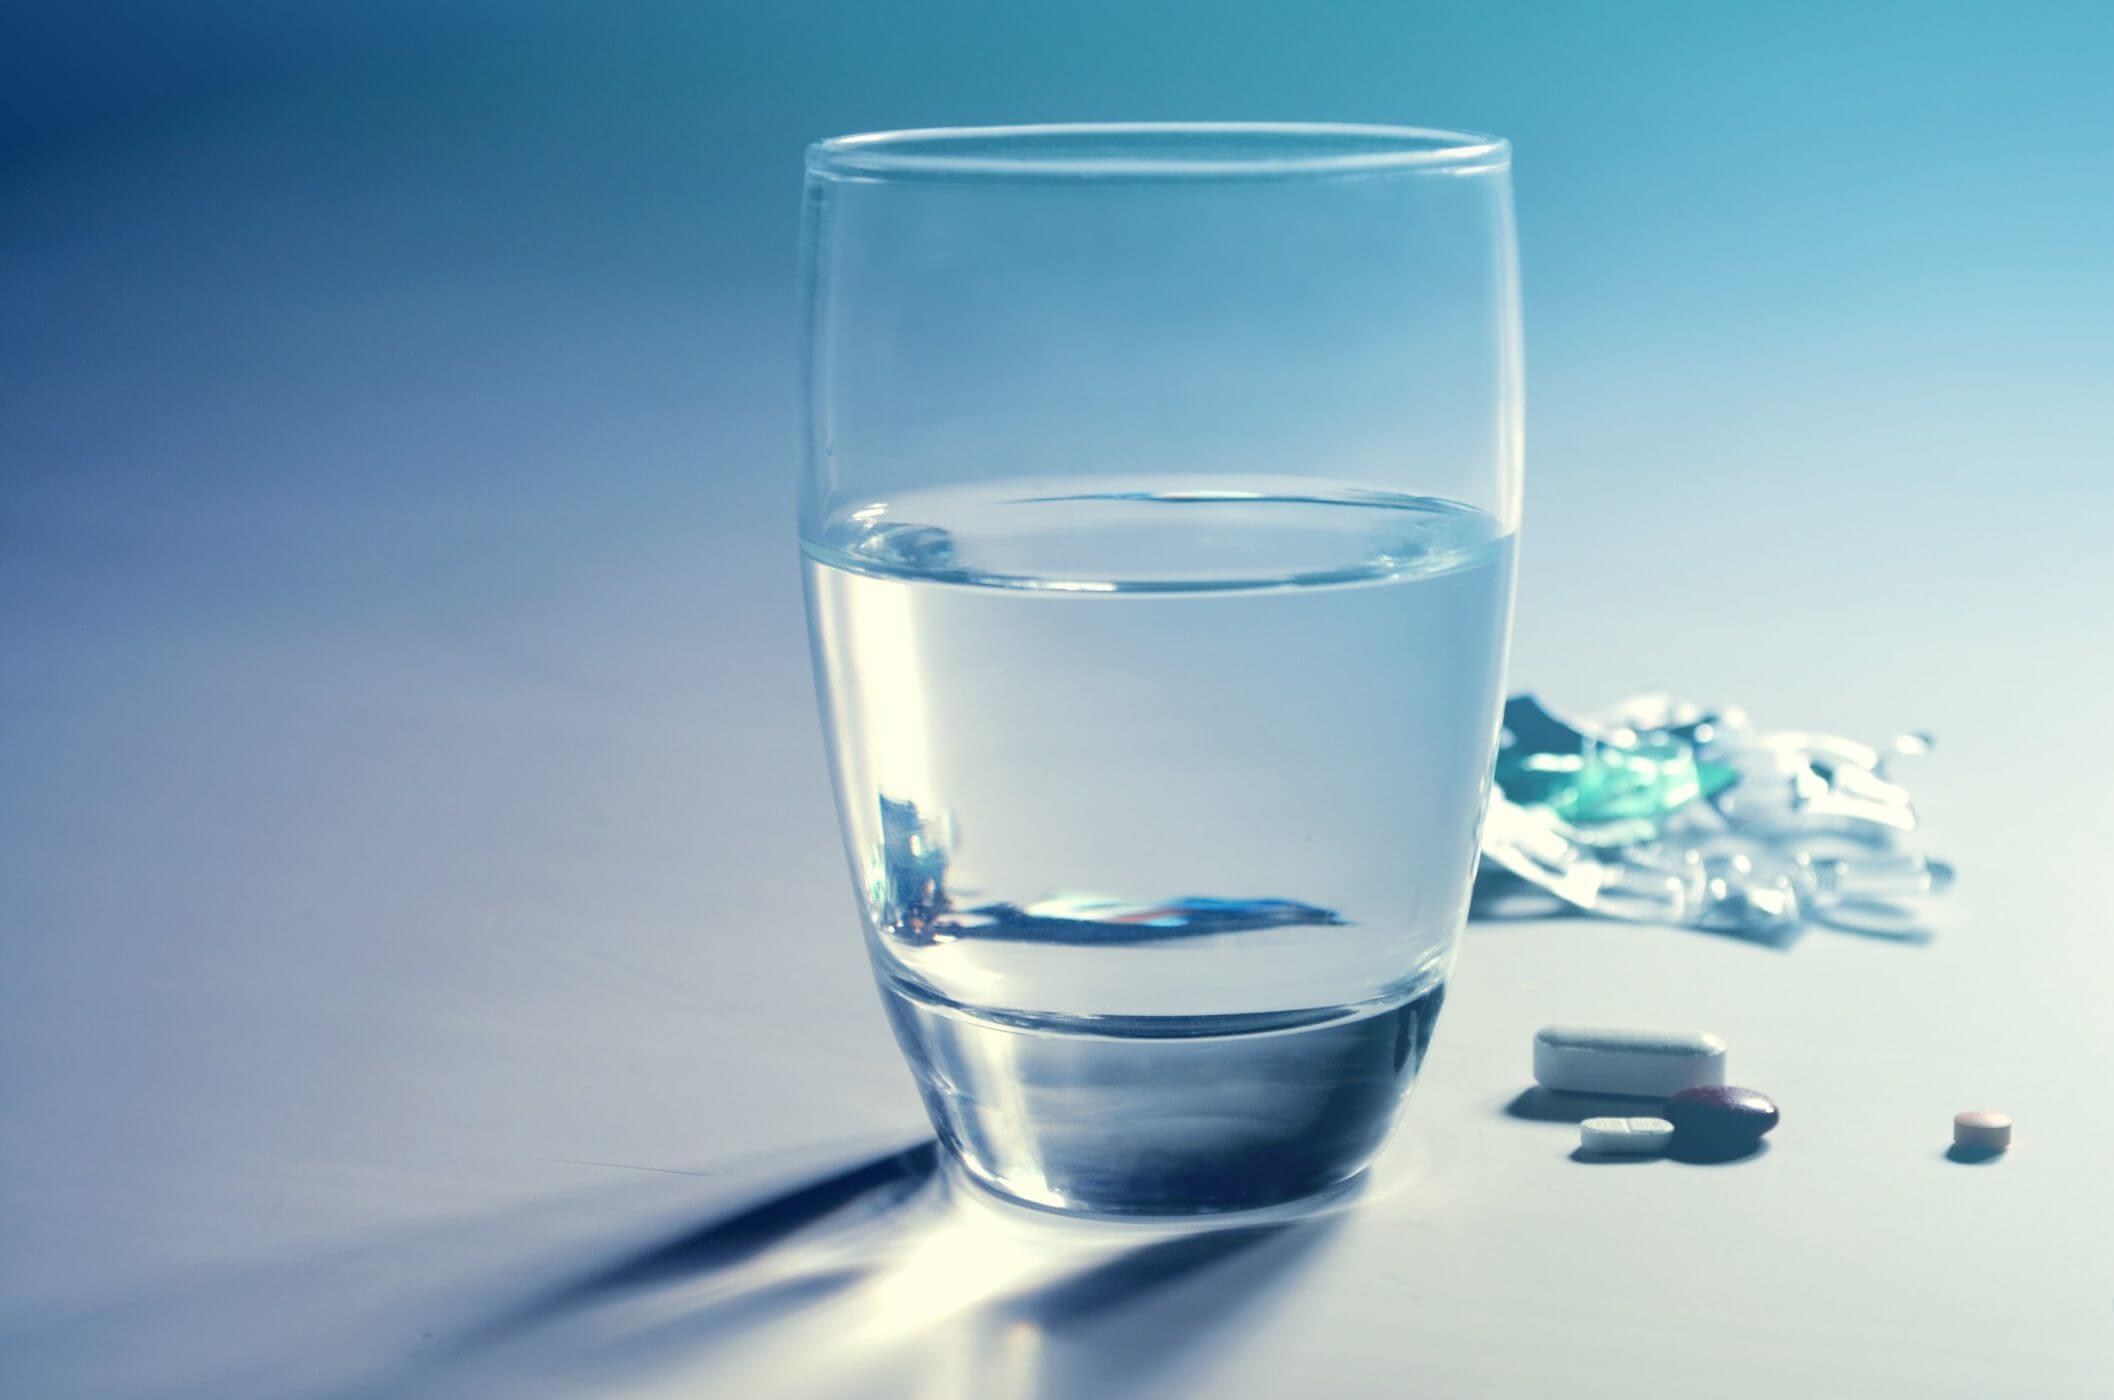 стакан воды картинки для презентации любви черкну